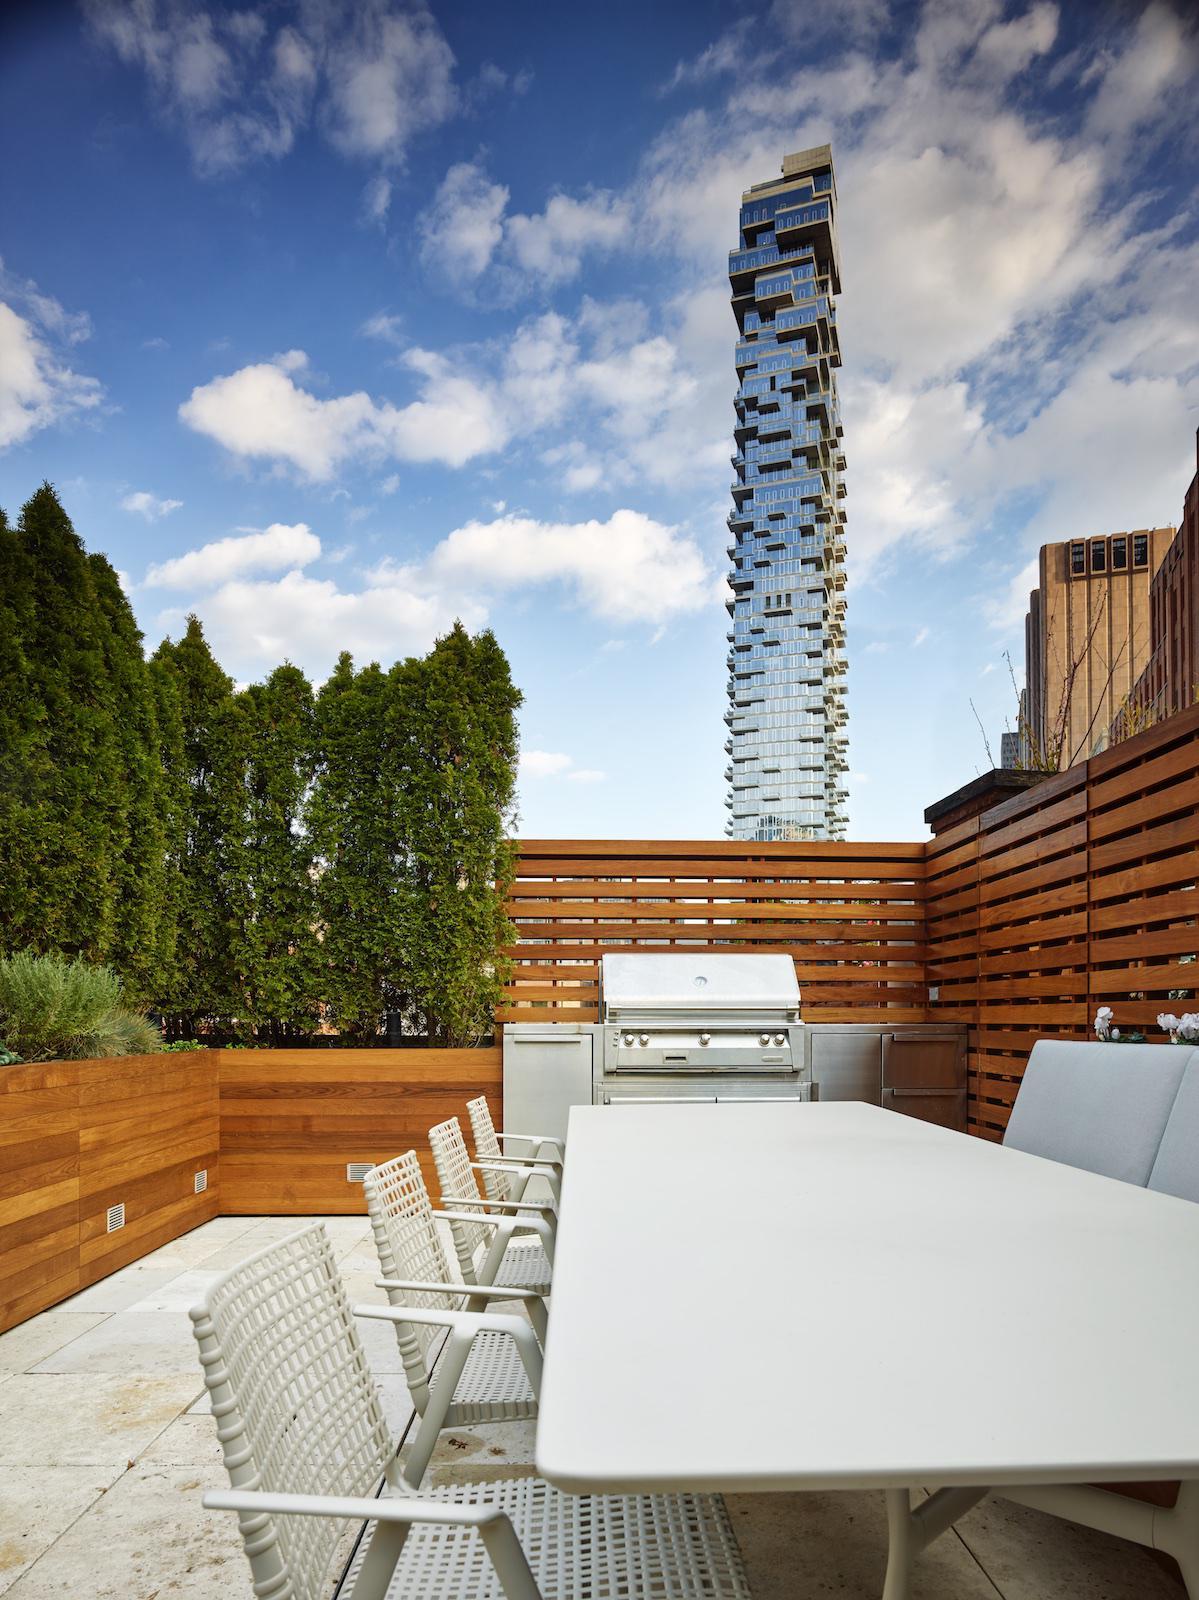 Schiller_TribecaRooftop-4-1 strategic design consultancy